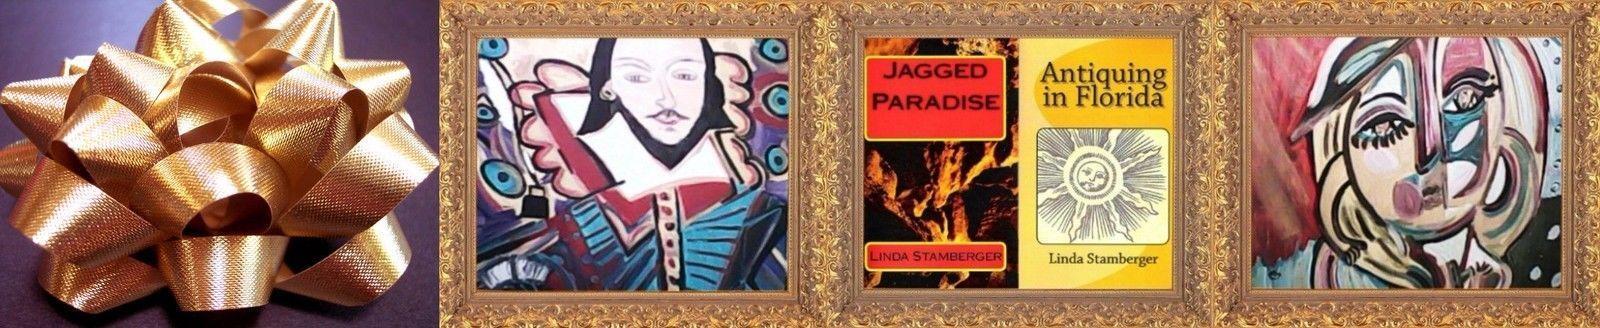 Stamberger Art and True Vintage